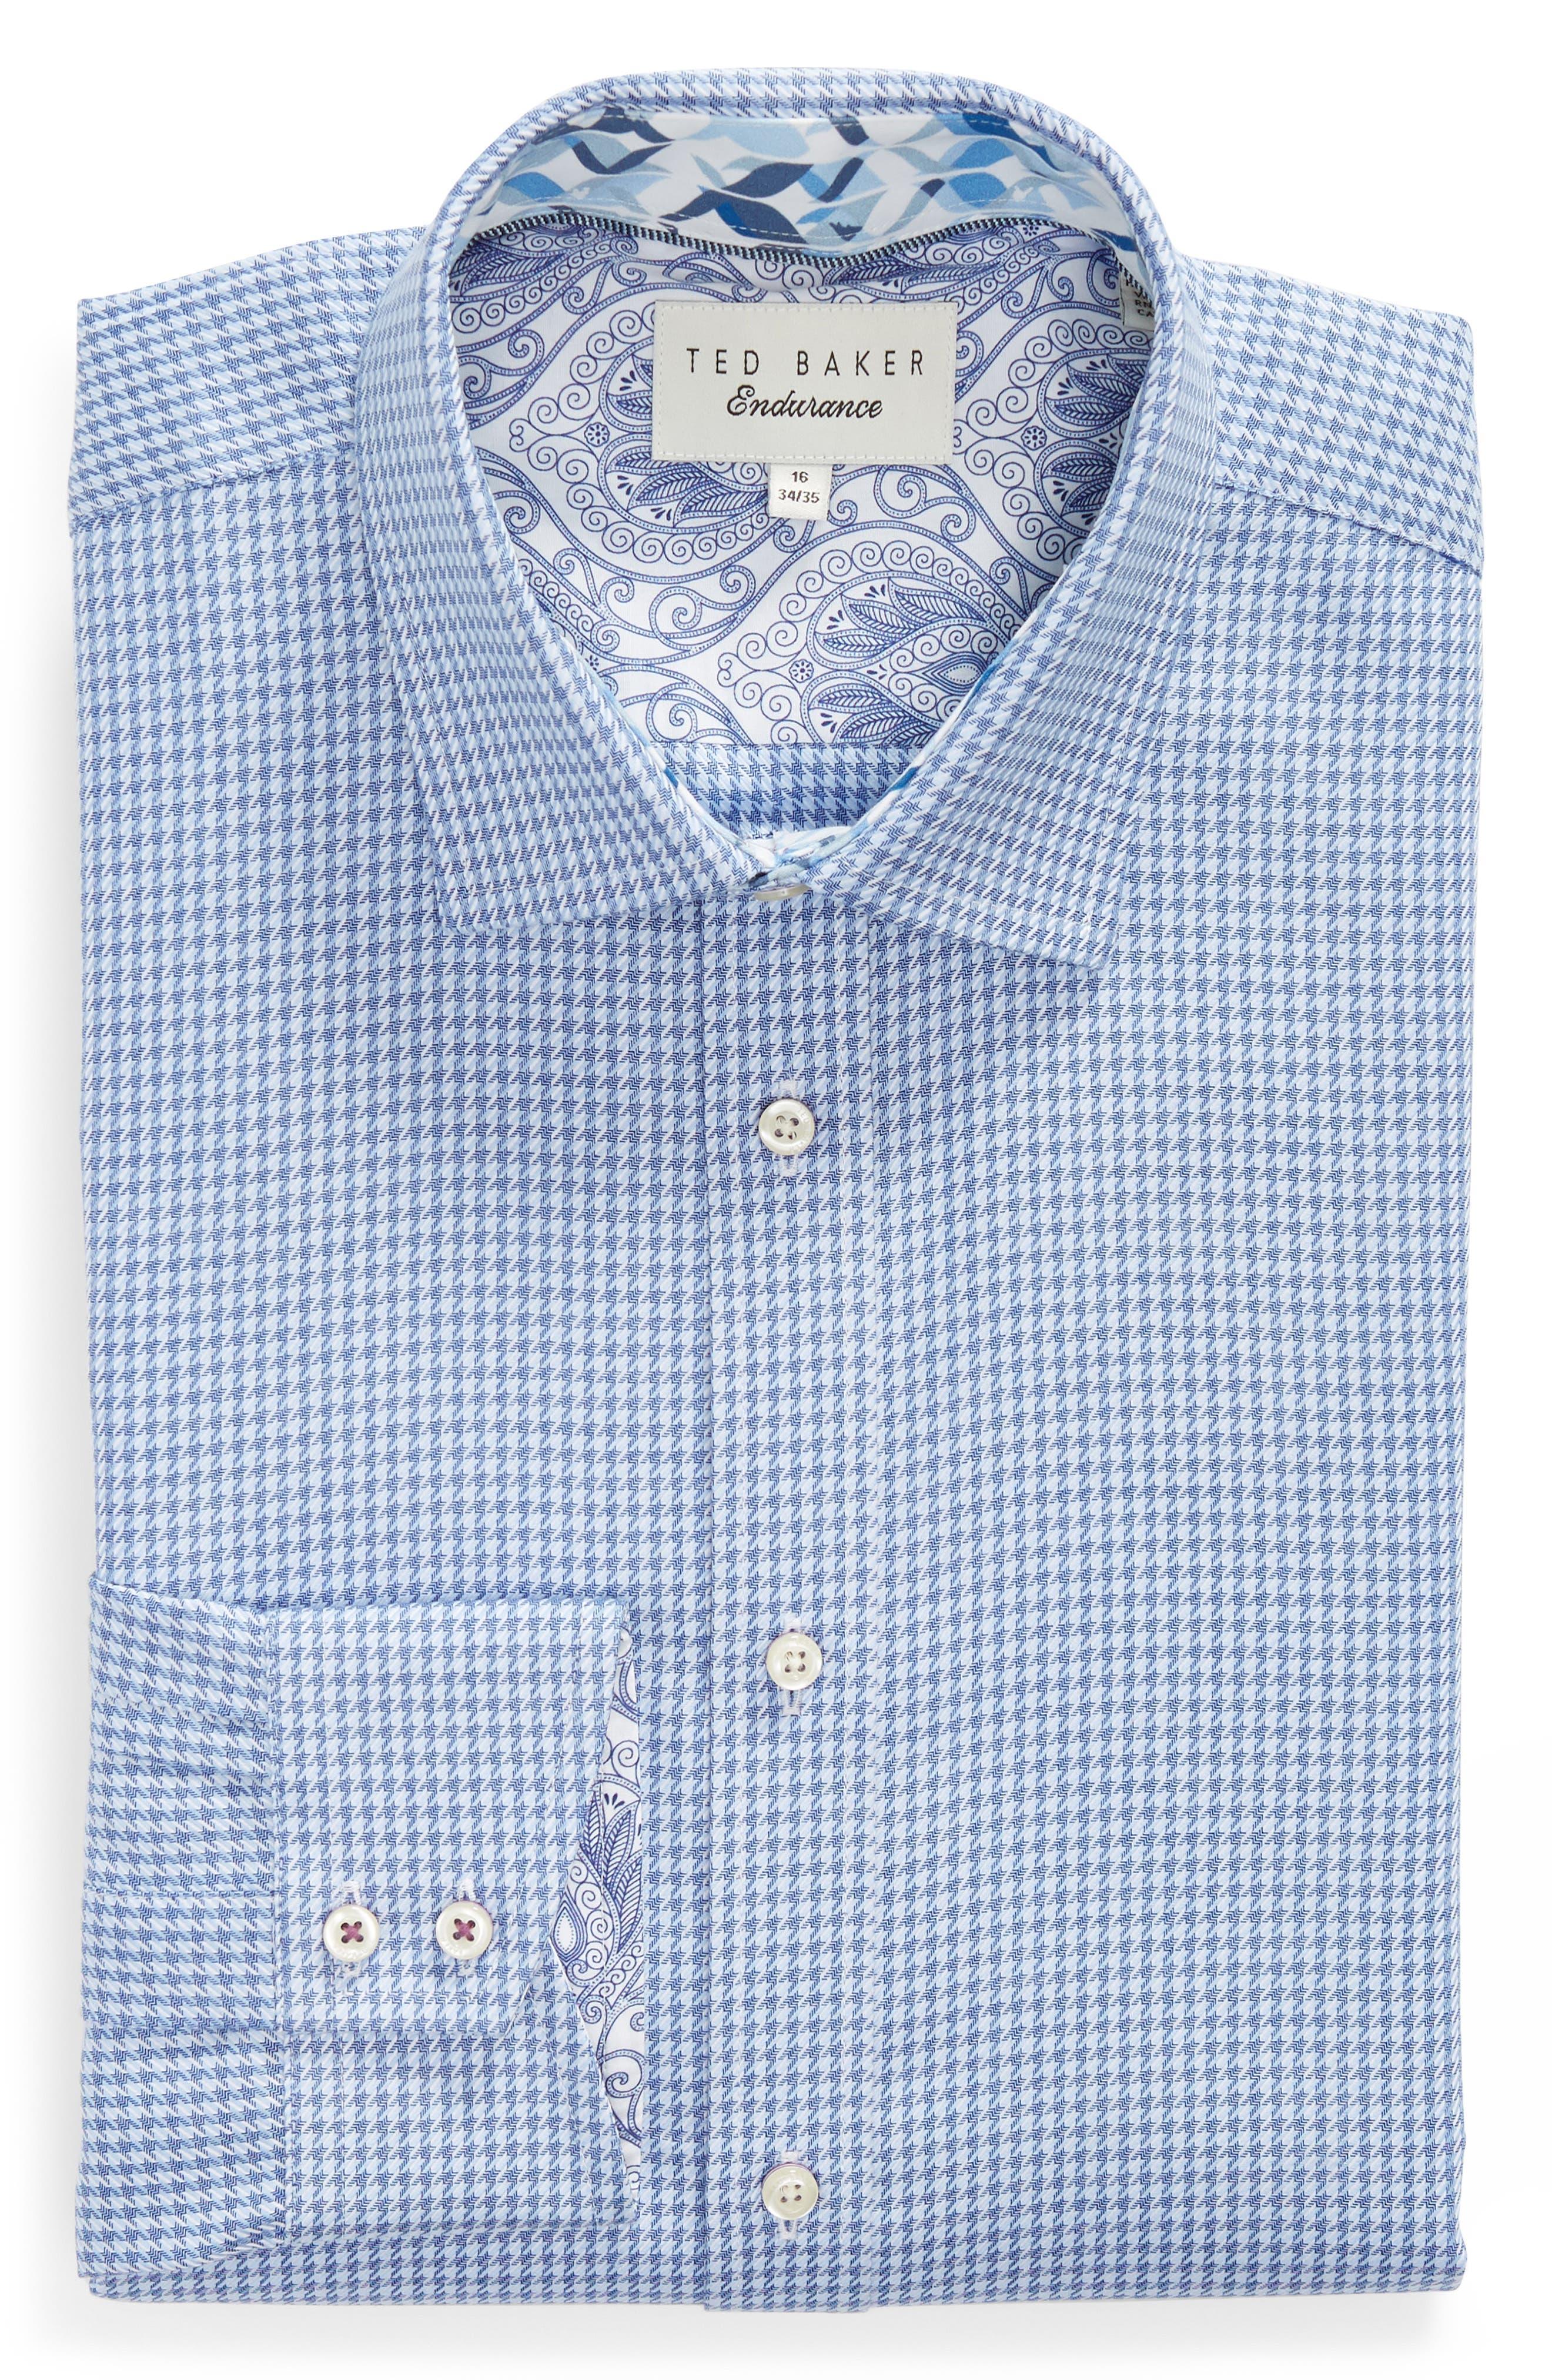 Franks Trim Fit Houndstooth Dress Shirt,                             Alternate thumbnail 5, color,                             BLUE